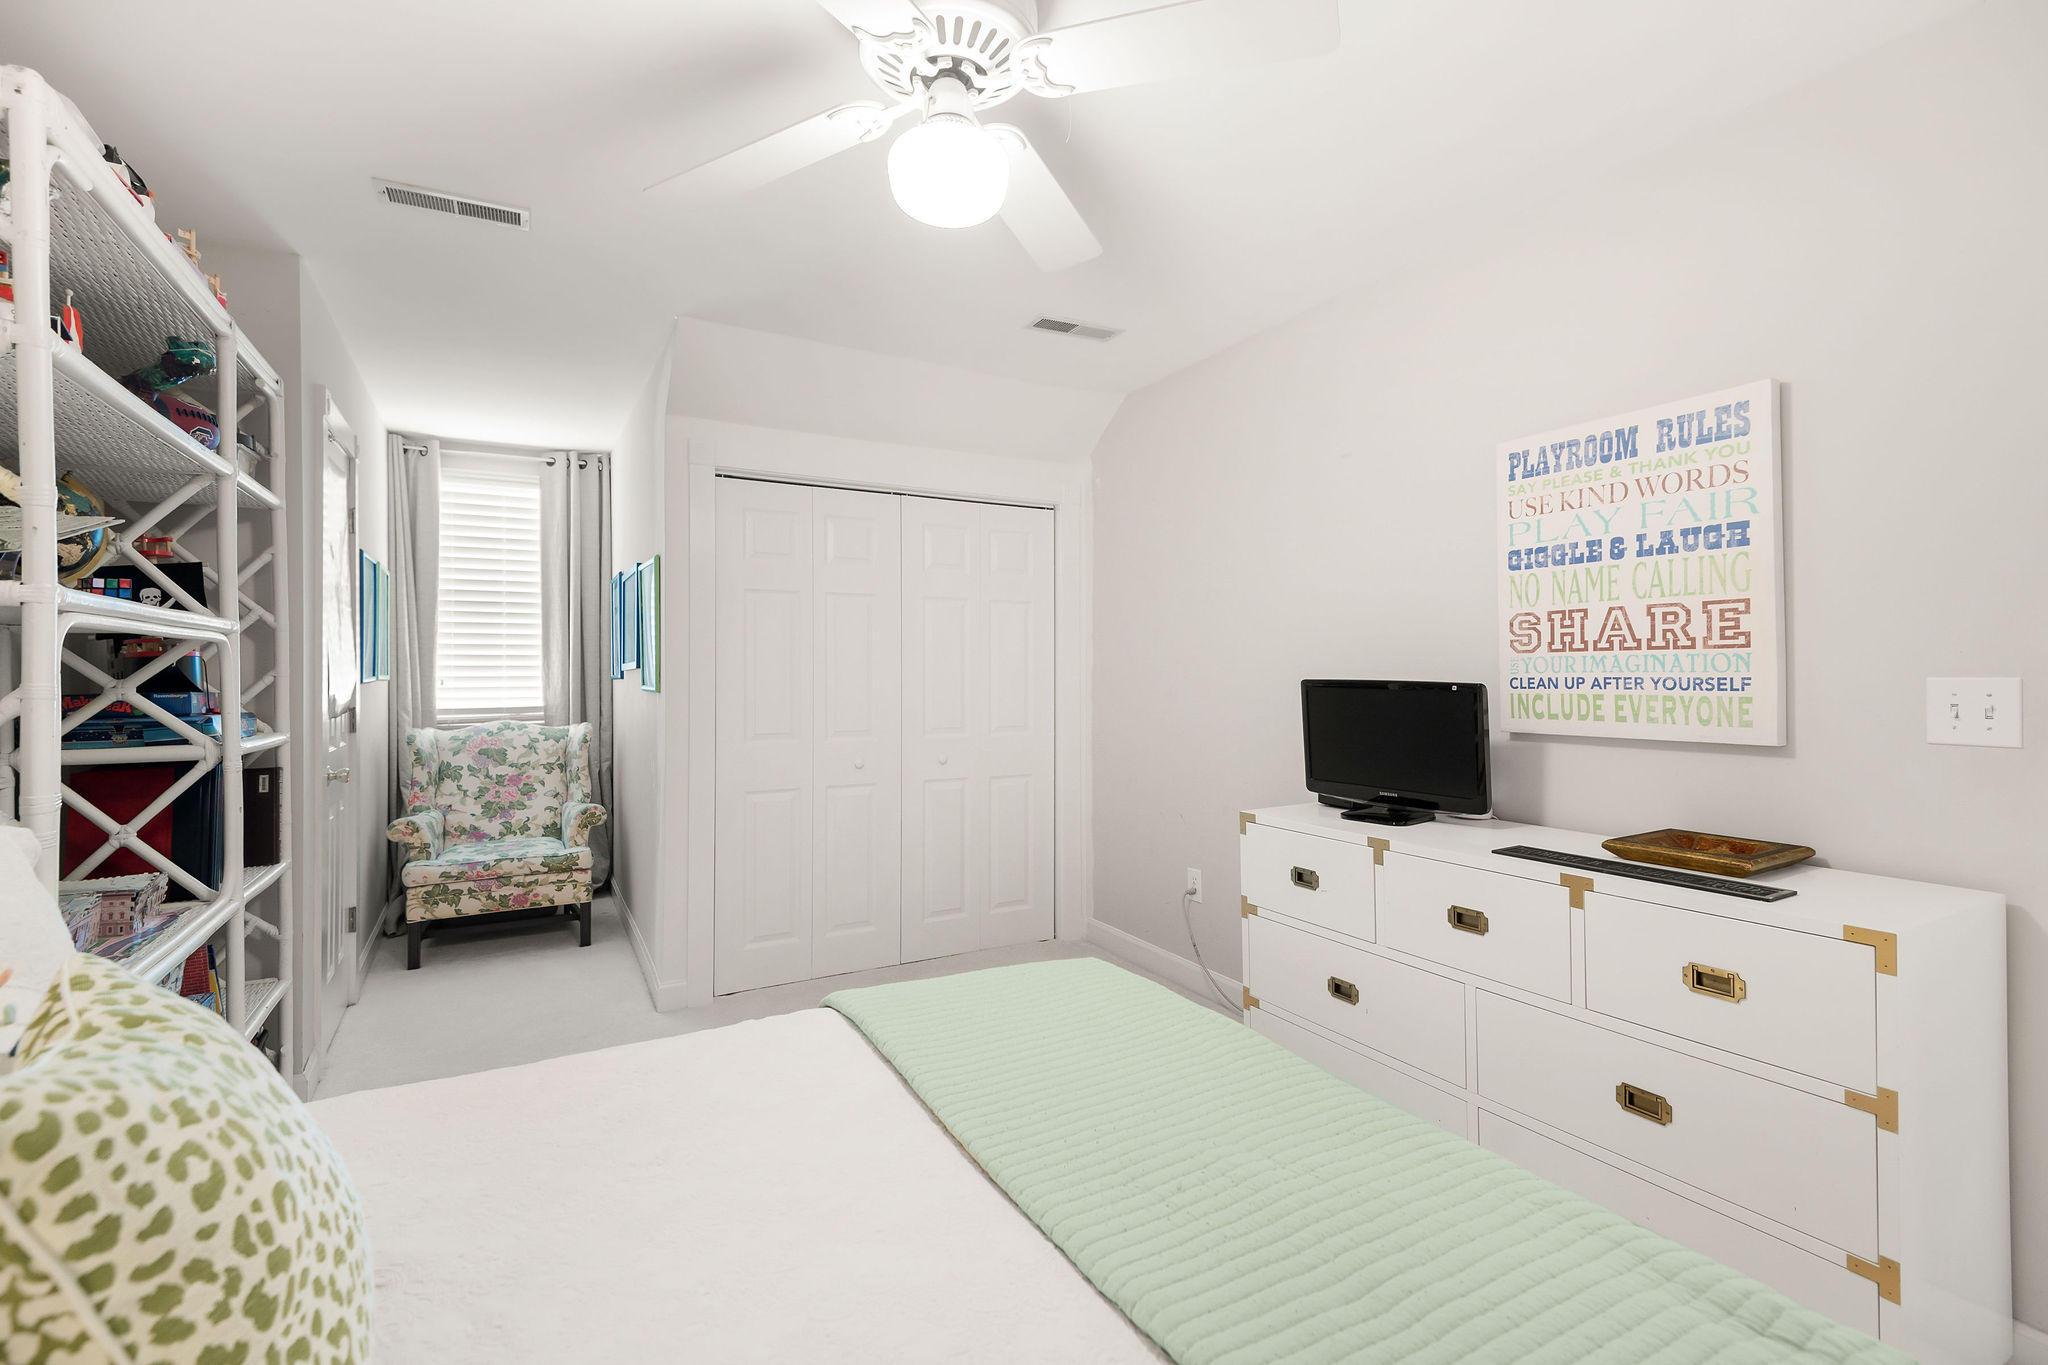 Country Club II Homes For Sale - 1482 Burningtree, Charleston, SC - 22